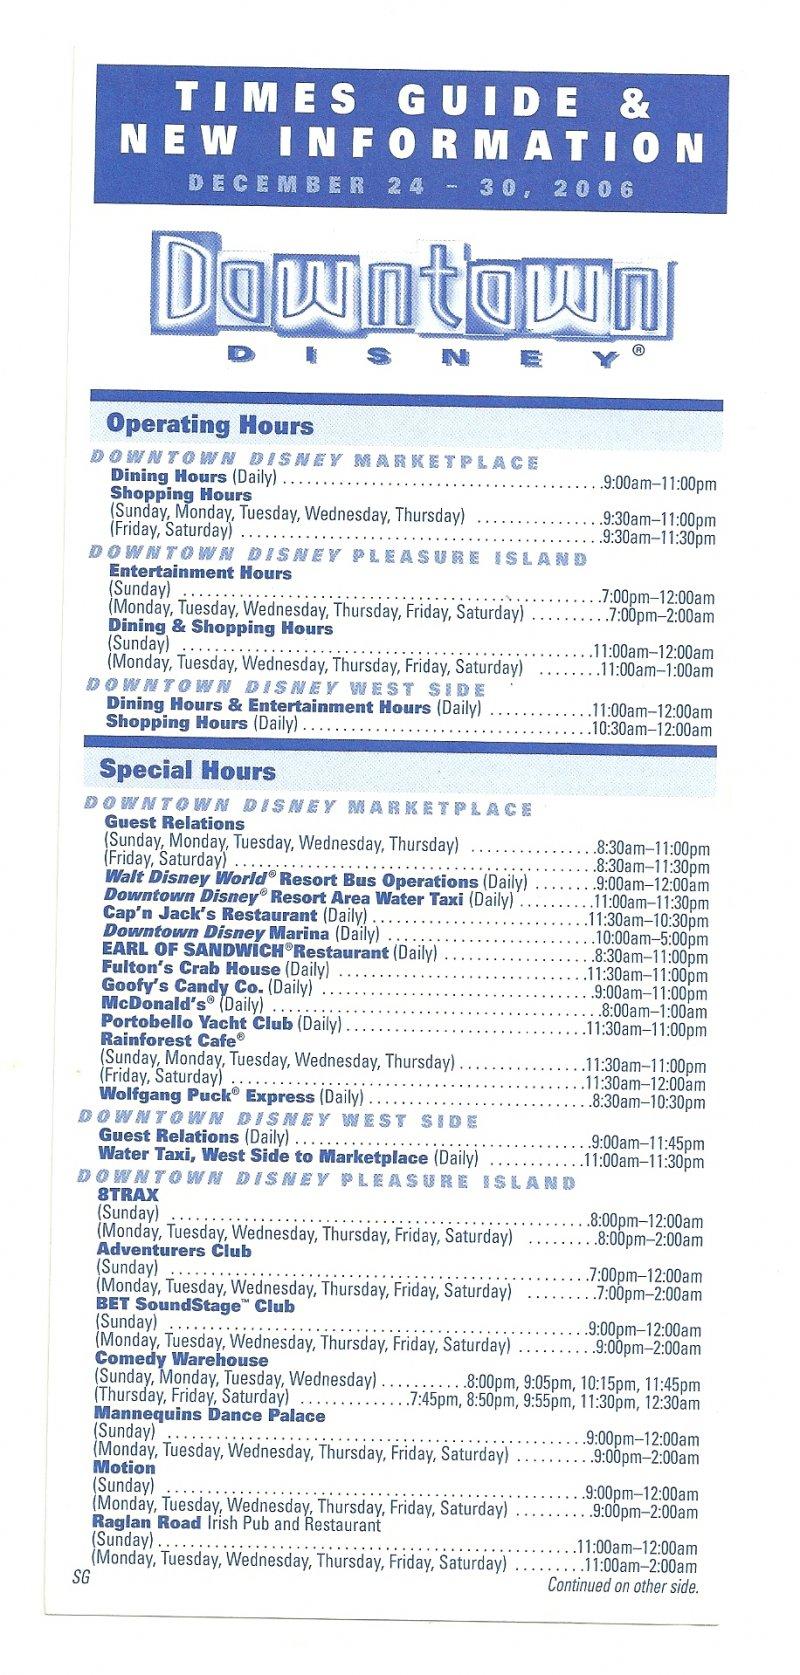 Image 0 of 2006 walt disney world Downtown Disney Times guide Flyer Dec 24-30